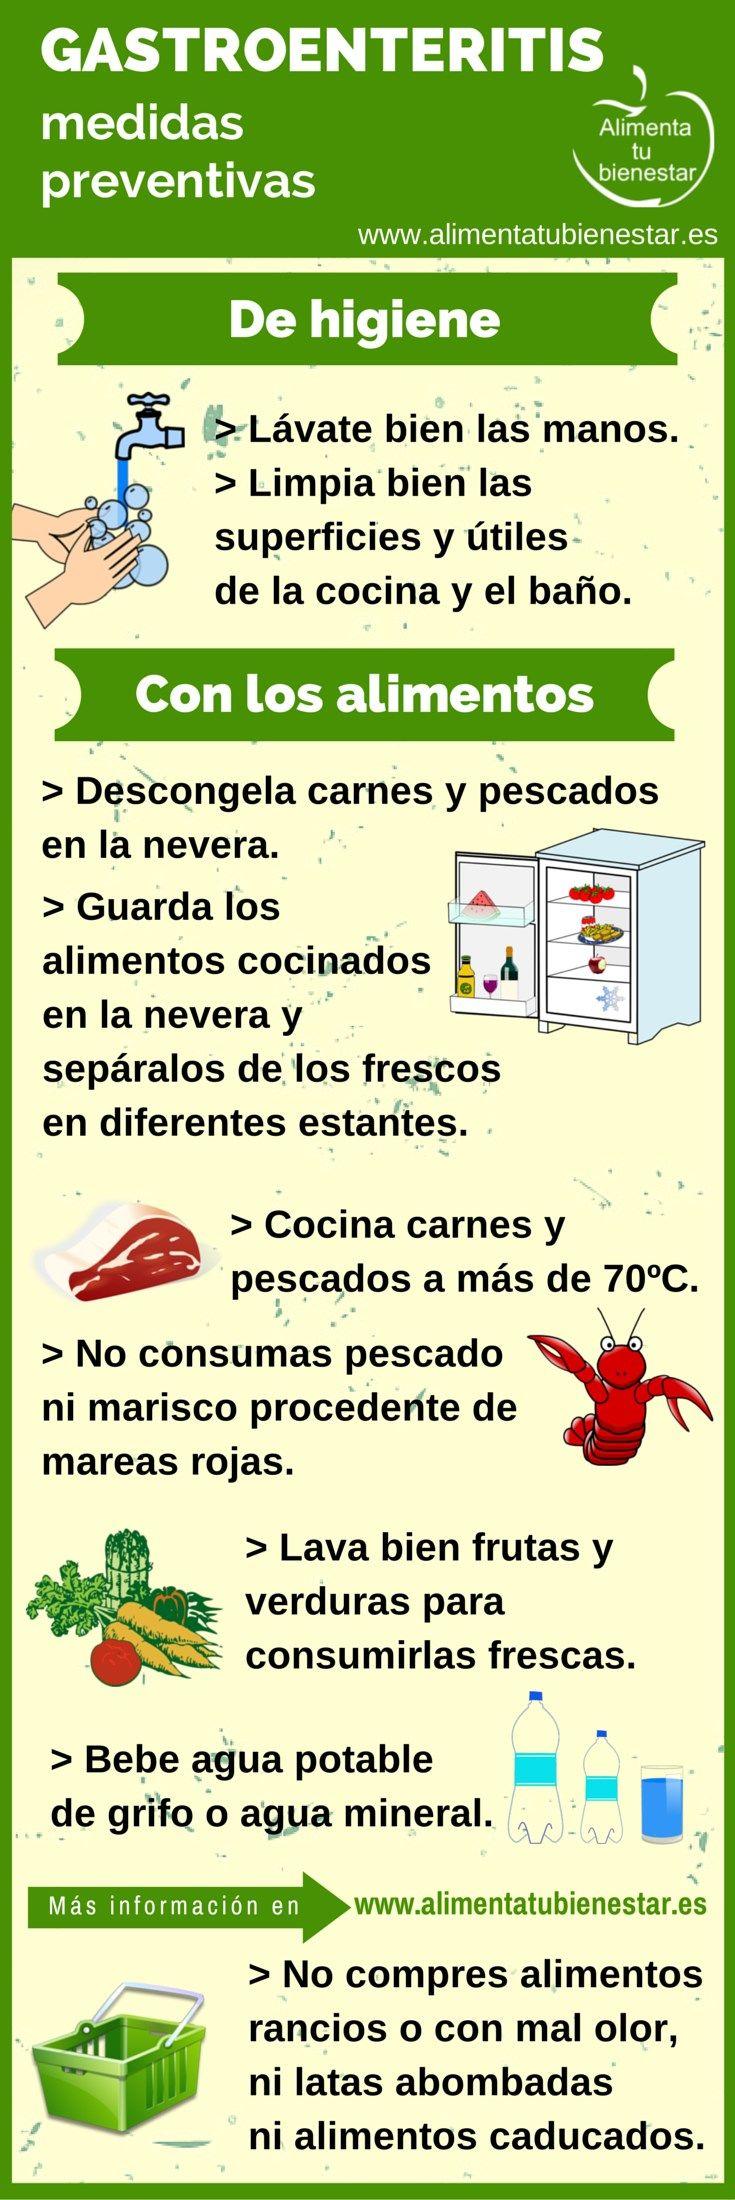 #Infografia #Gastroenteritis: medidas preventivas